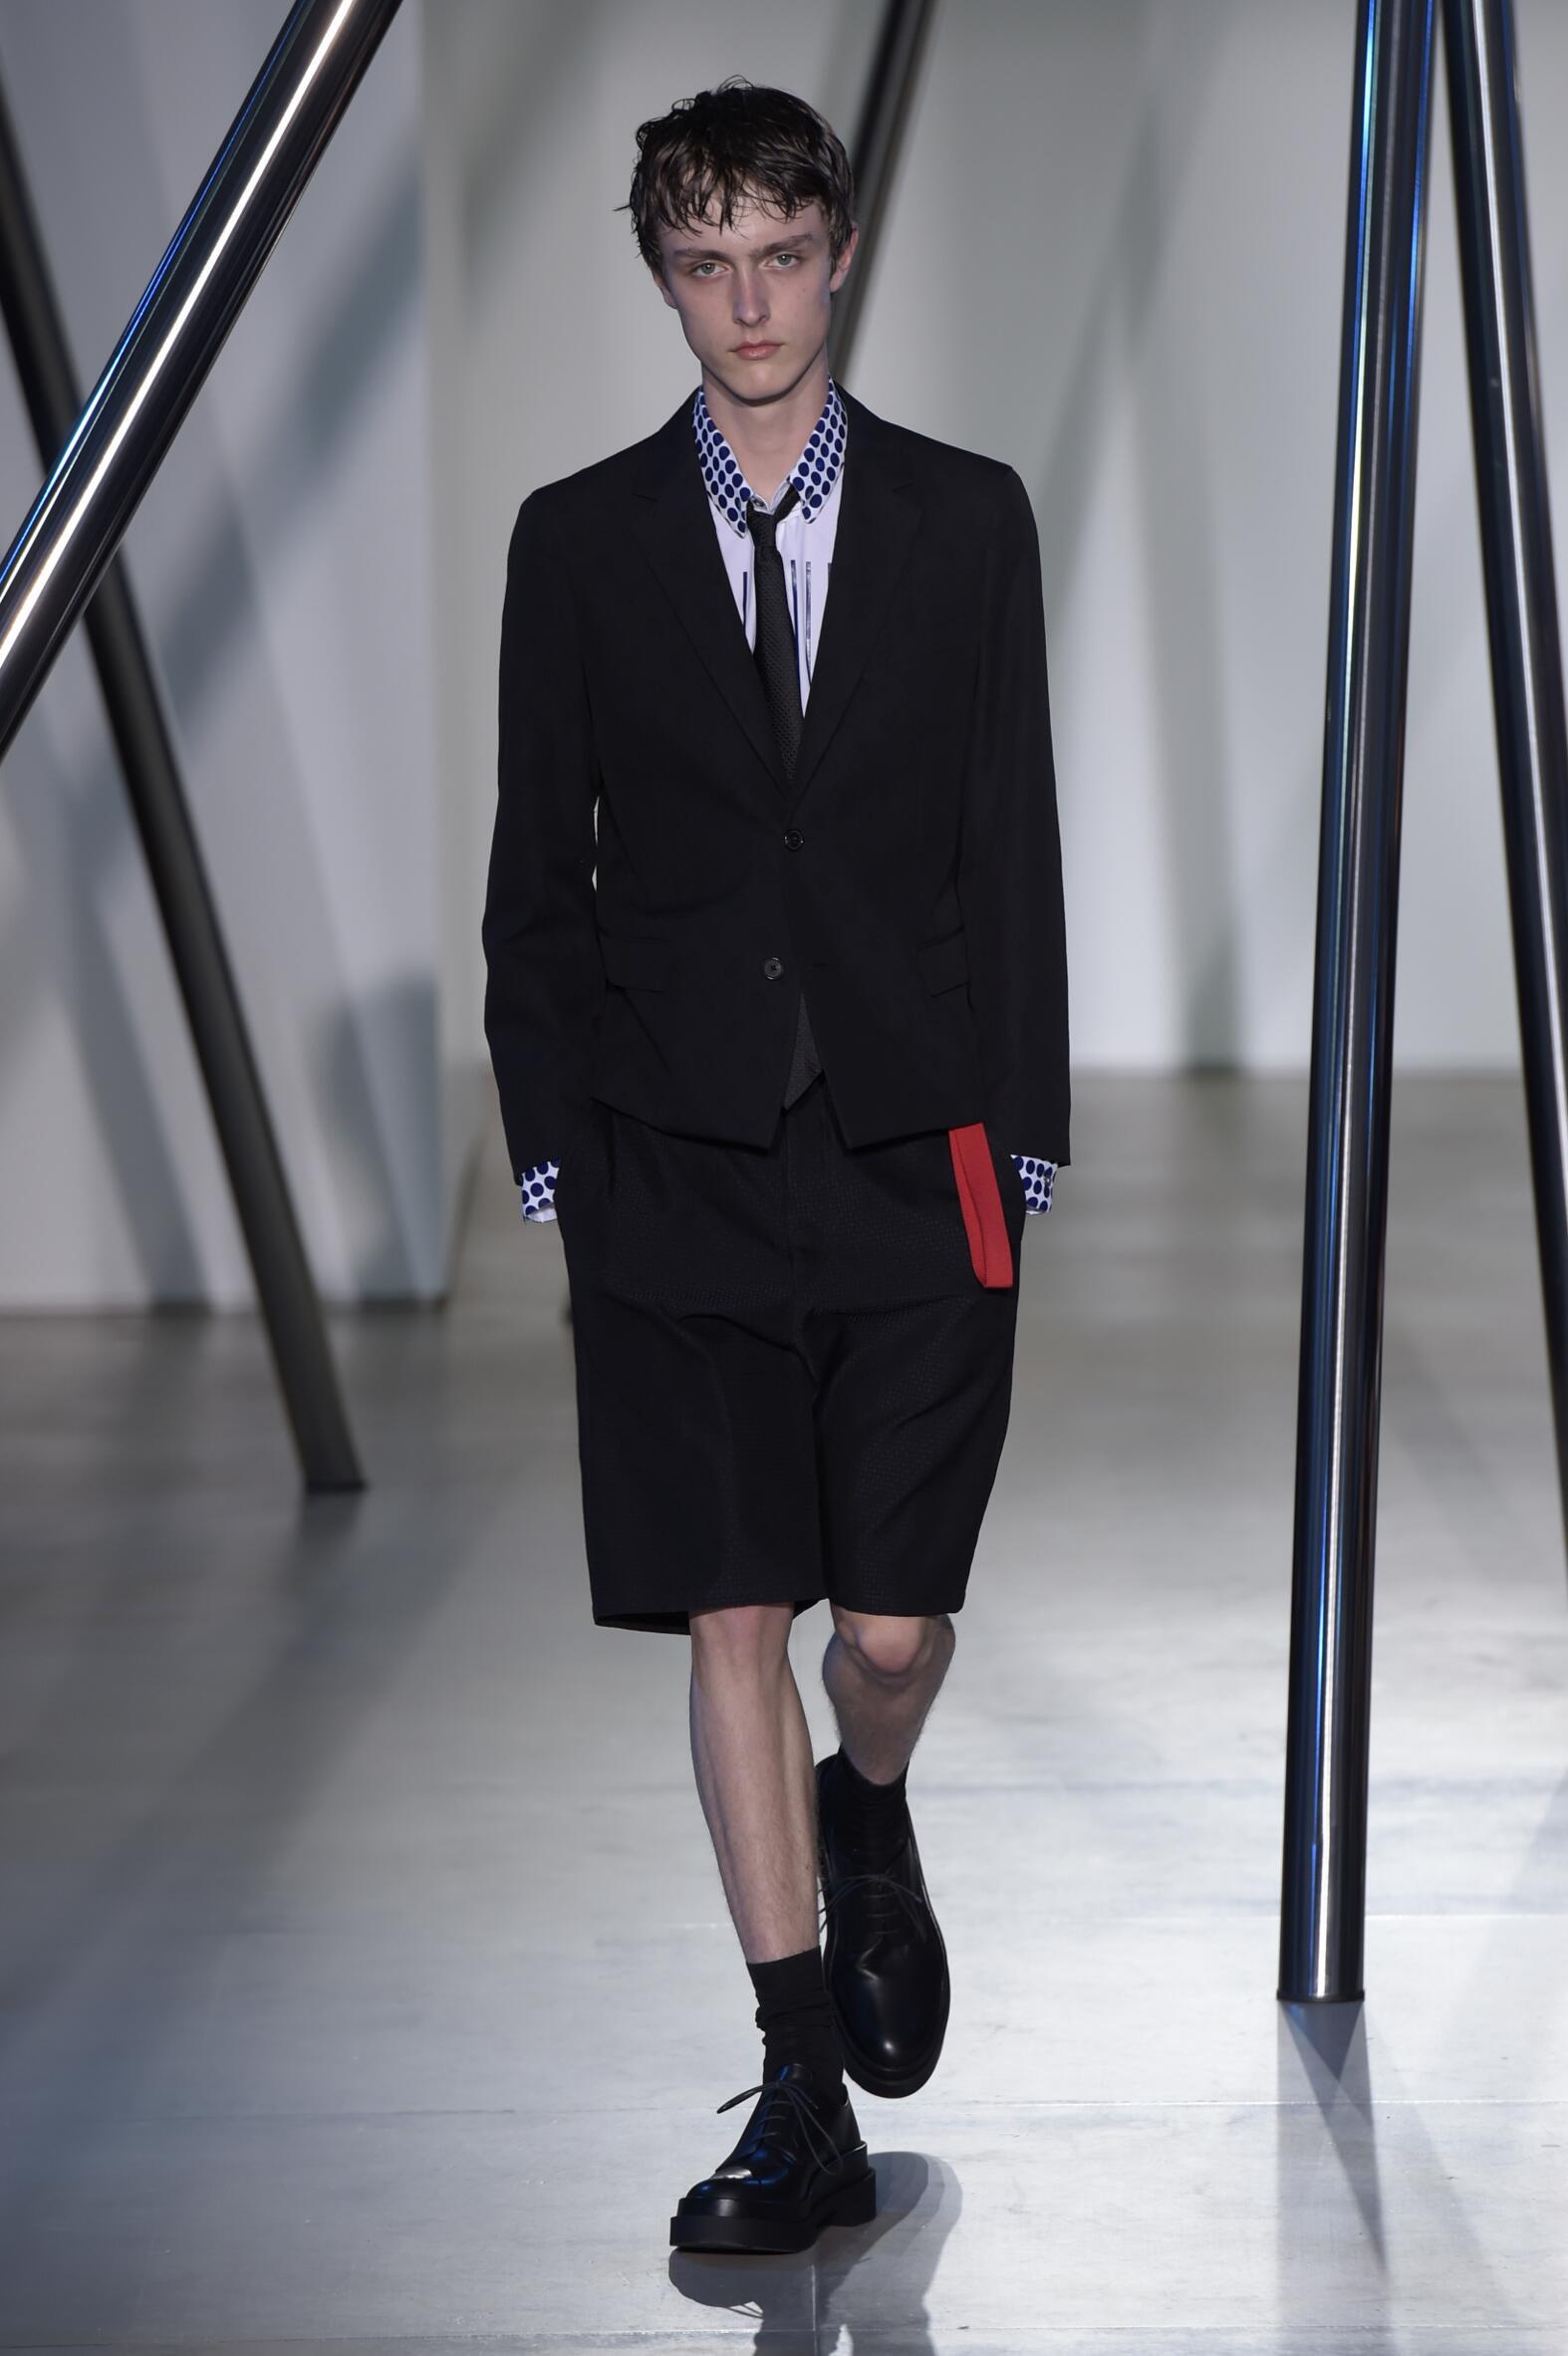 2016 Fashion Man Model Jil Sander Collection Catwalk